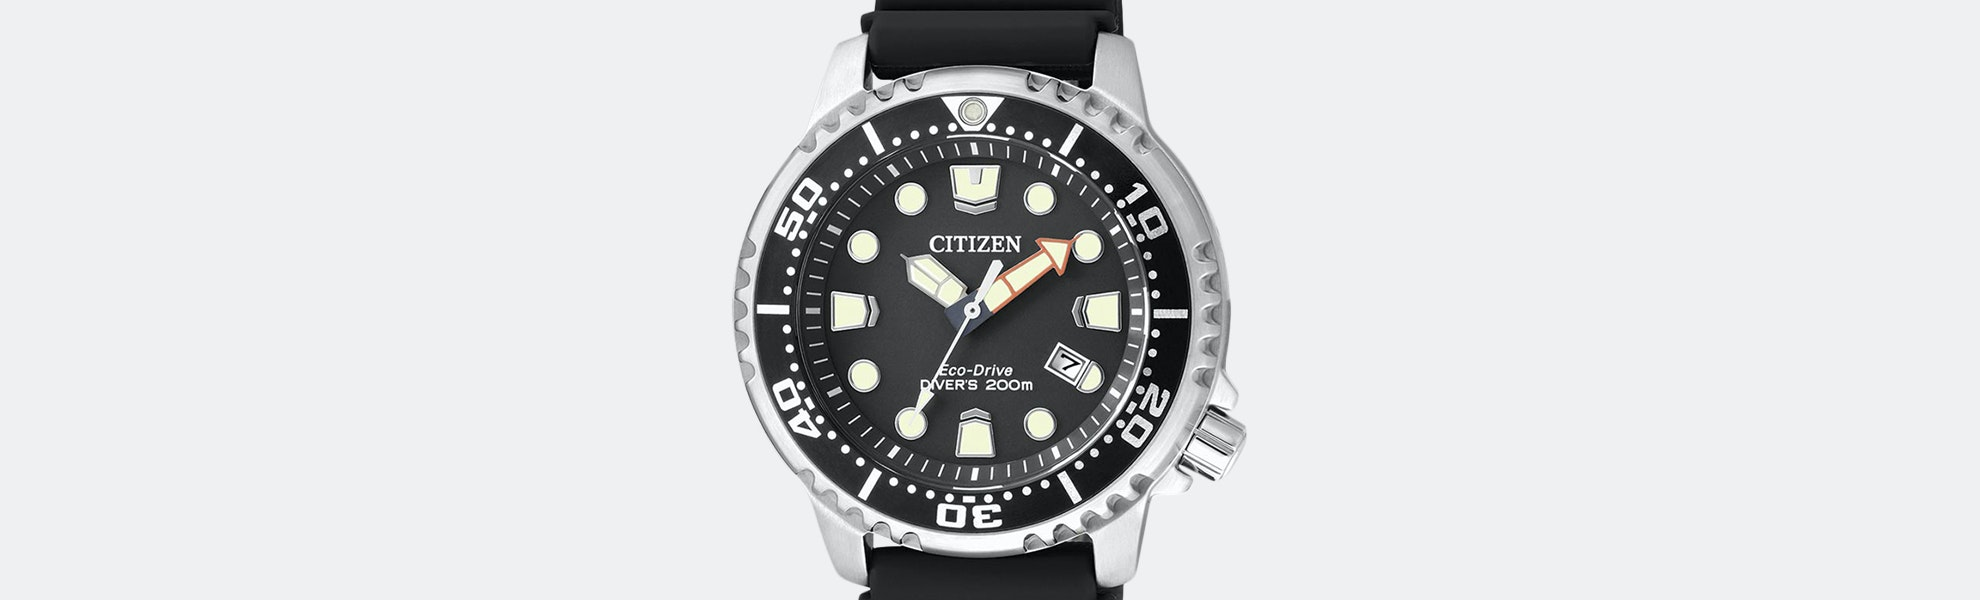 Citizen Eco-Drive Promaster Solar Dive Watch